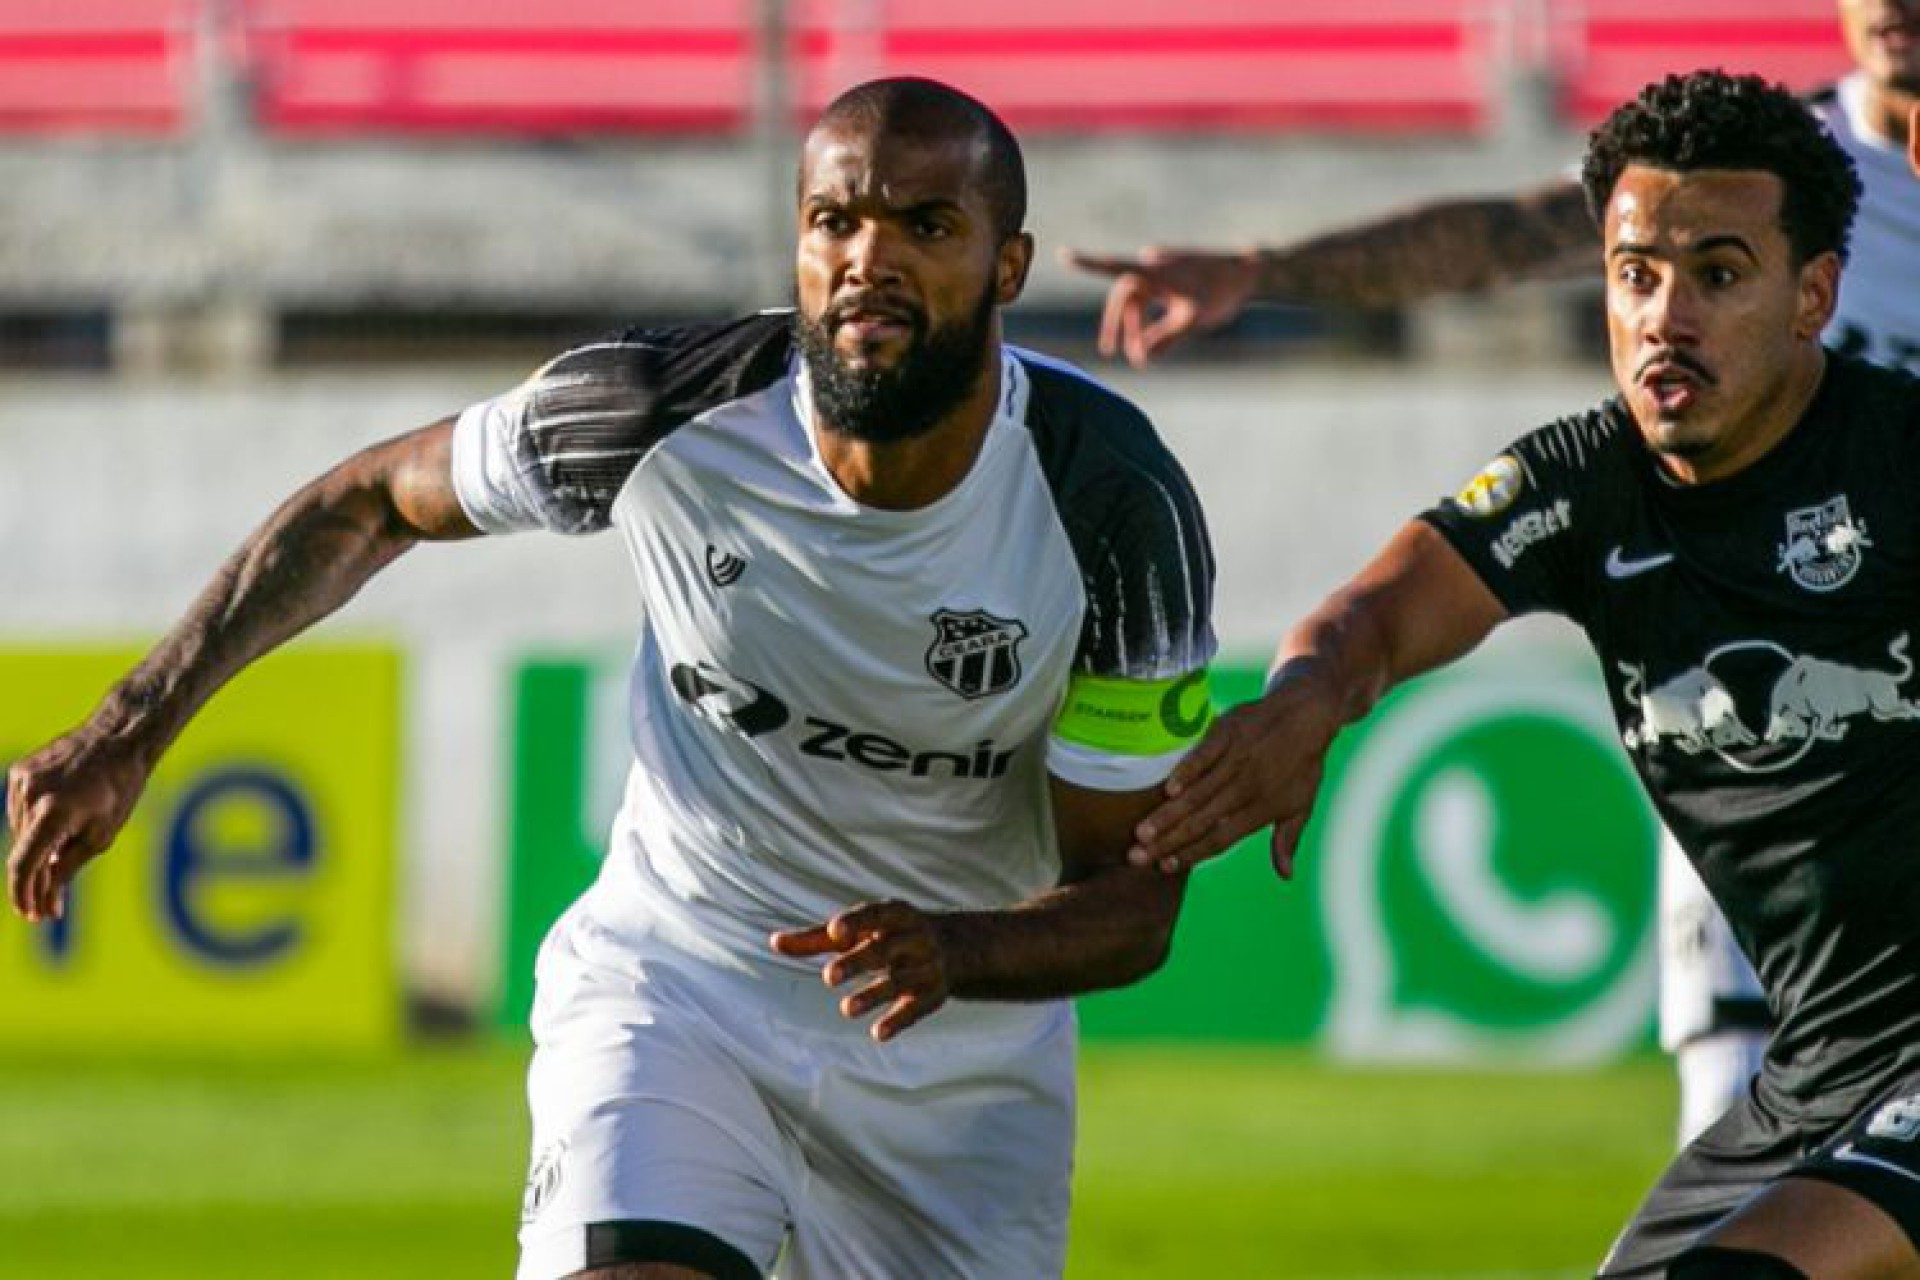 Messias teve dez cortes defensivos durante o jogo, afastando lances de ataque do Bragantino (Foto: Fausto Filho / Ceará SC )